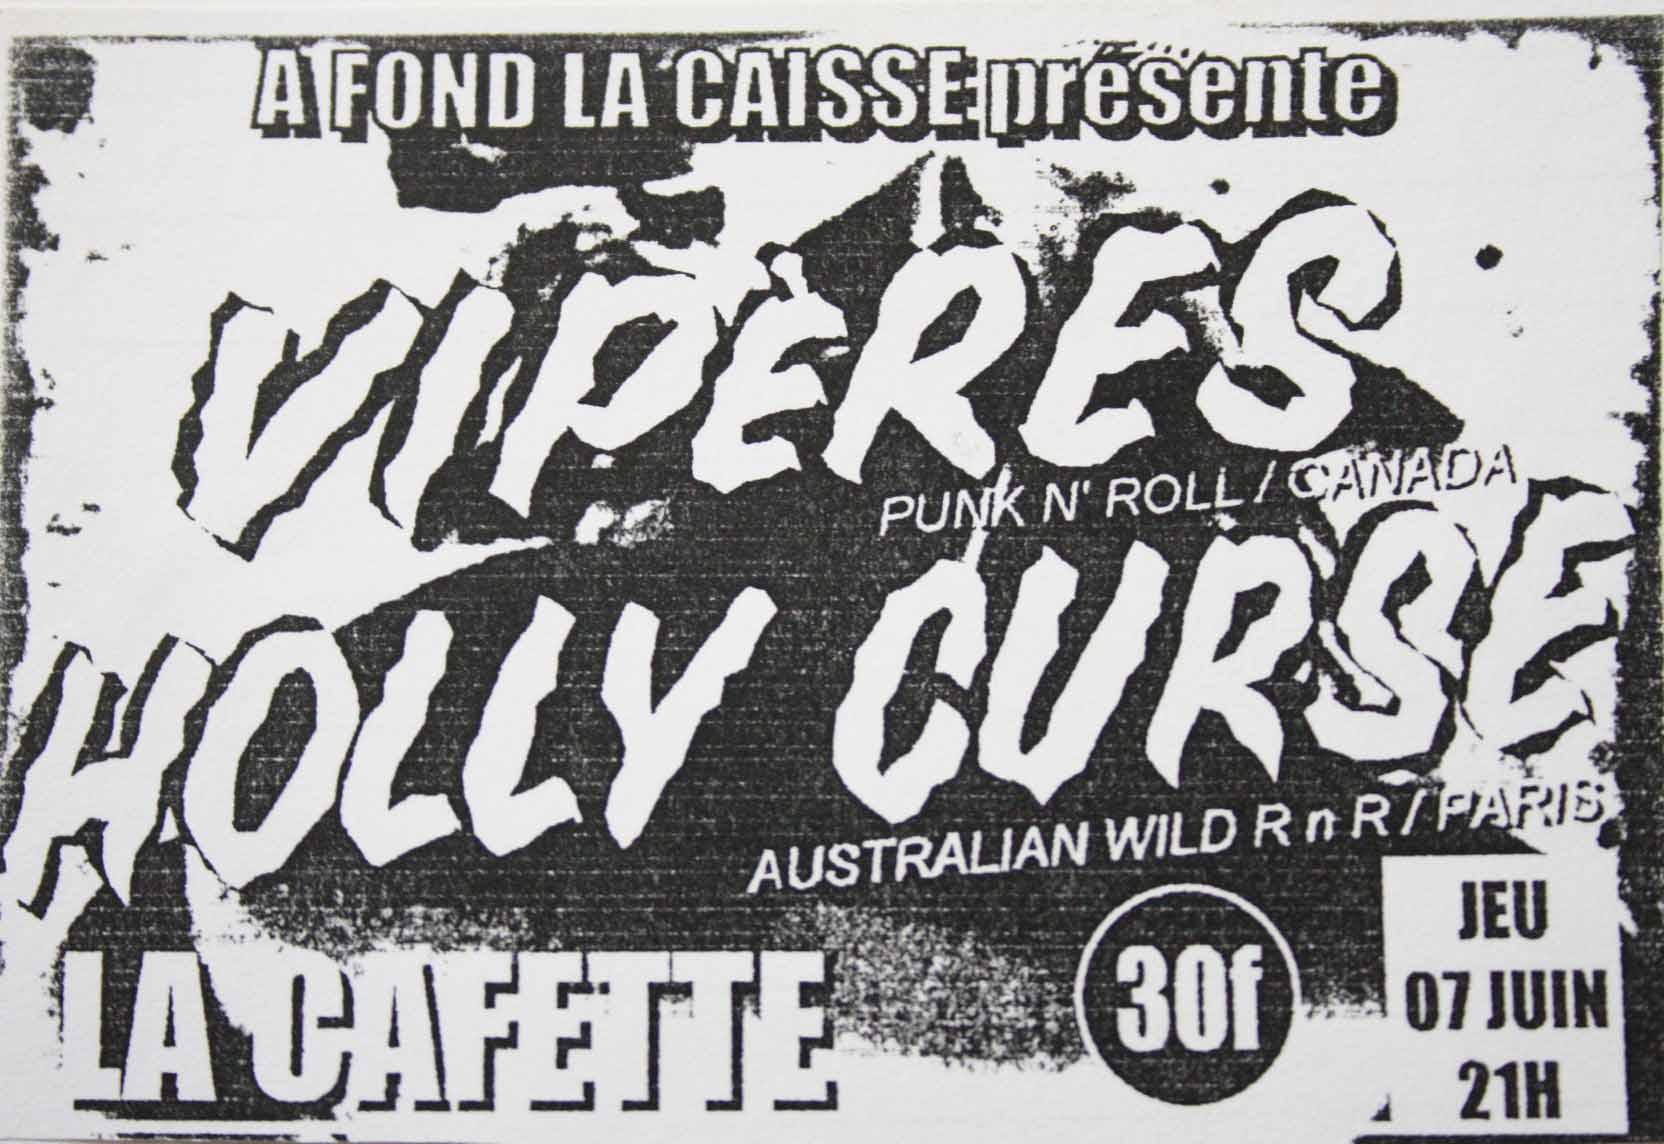 "7 juin 2001 Viperes, Holly Curse au Havre ""Cafette"""